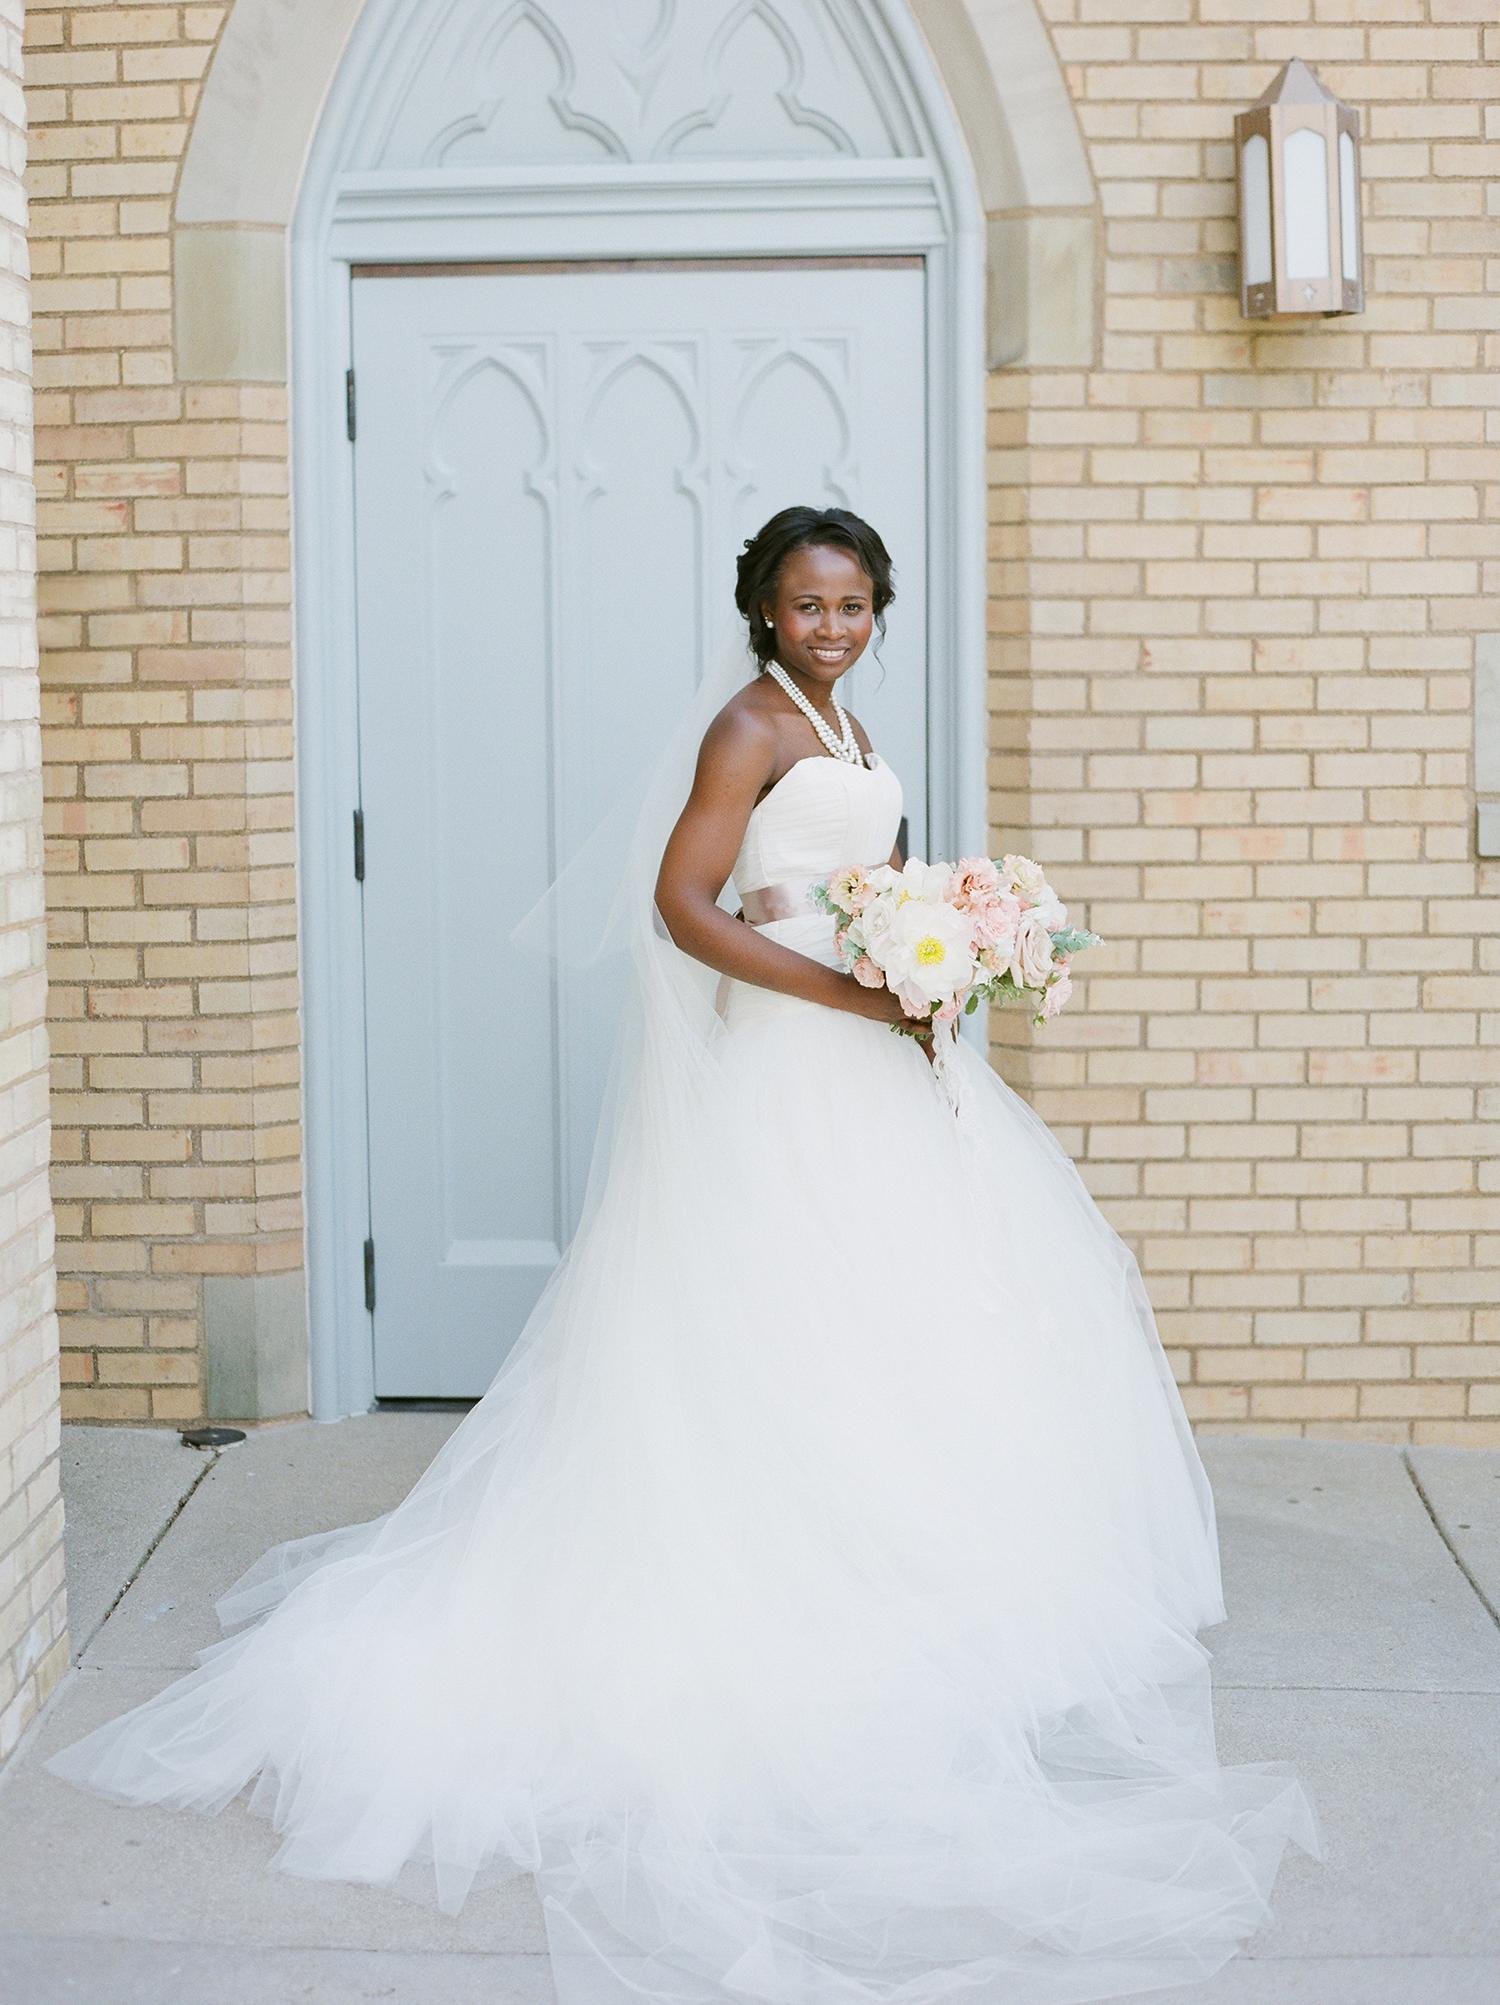 anwuli patrick wedding bride